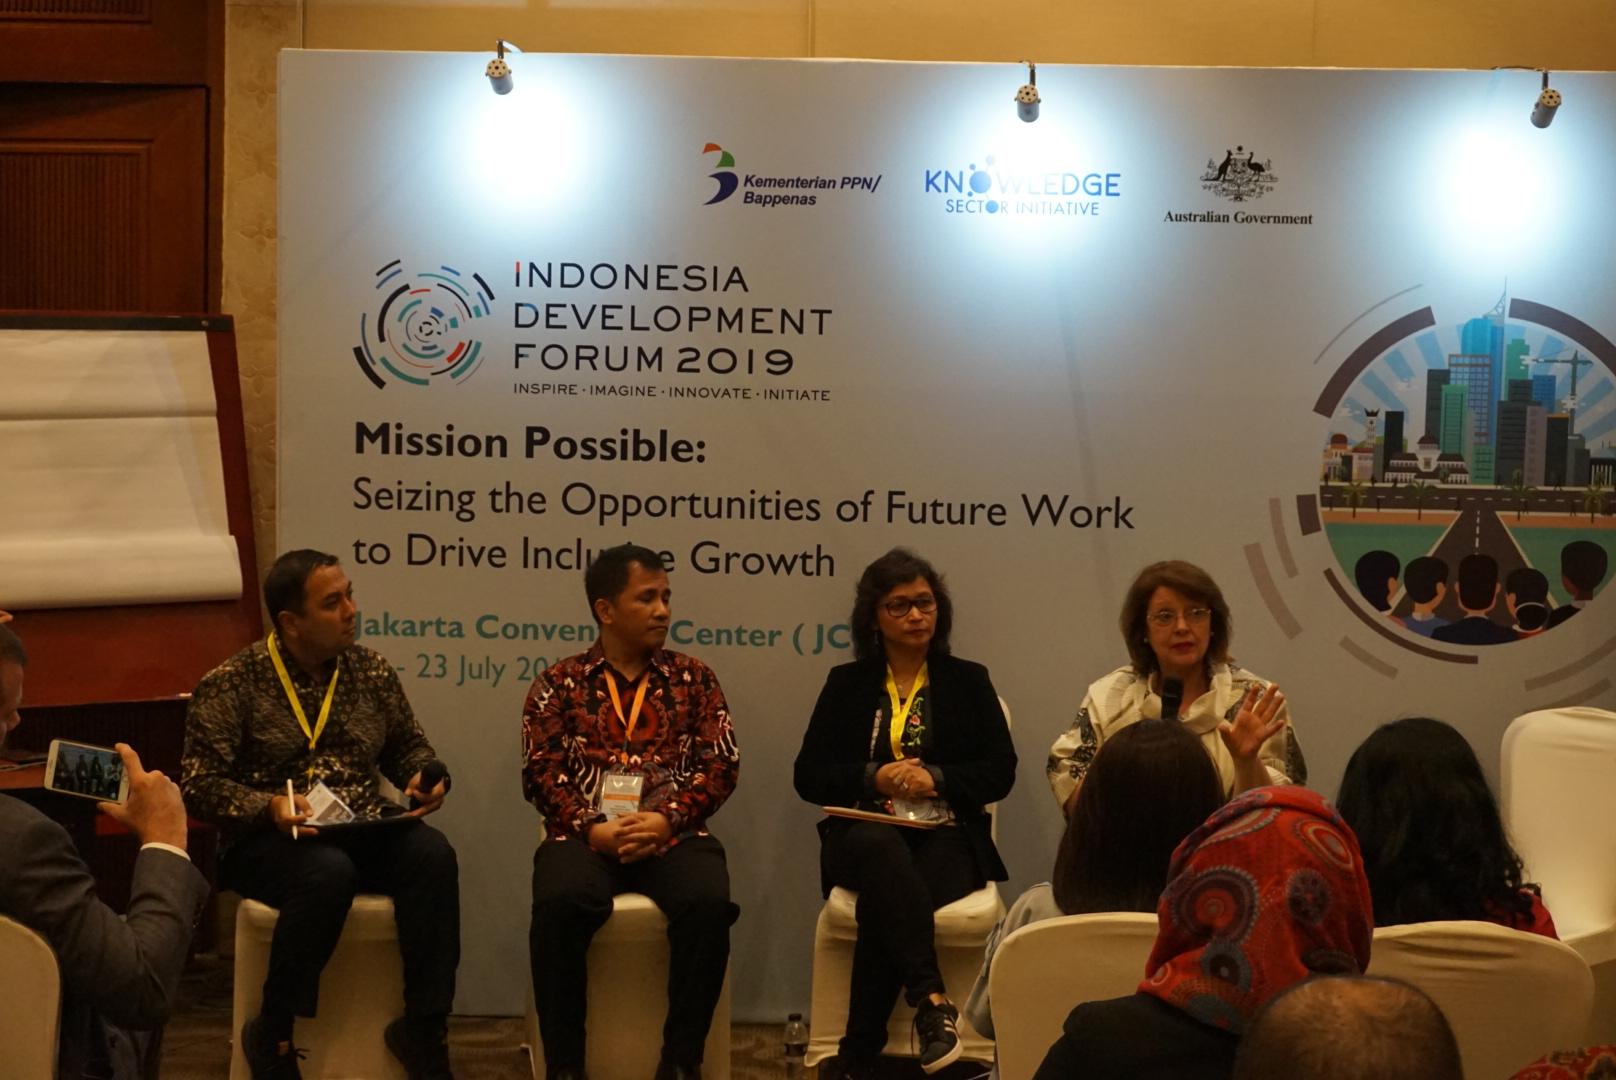 Dr. Ari Margiono, Leonardo Adypurnama Teguh Sambodo, Maria R Nindita Radyati, Baroness Glenys Thornton in Social Enterprise Policy Consultation session